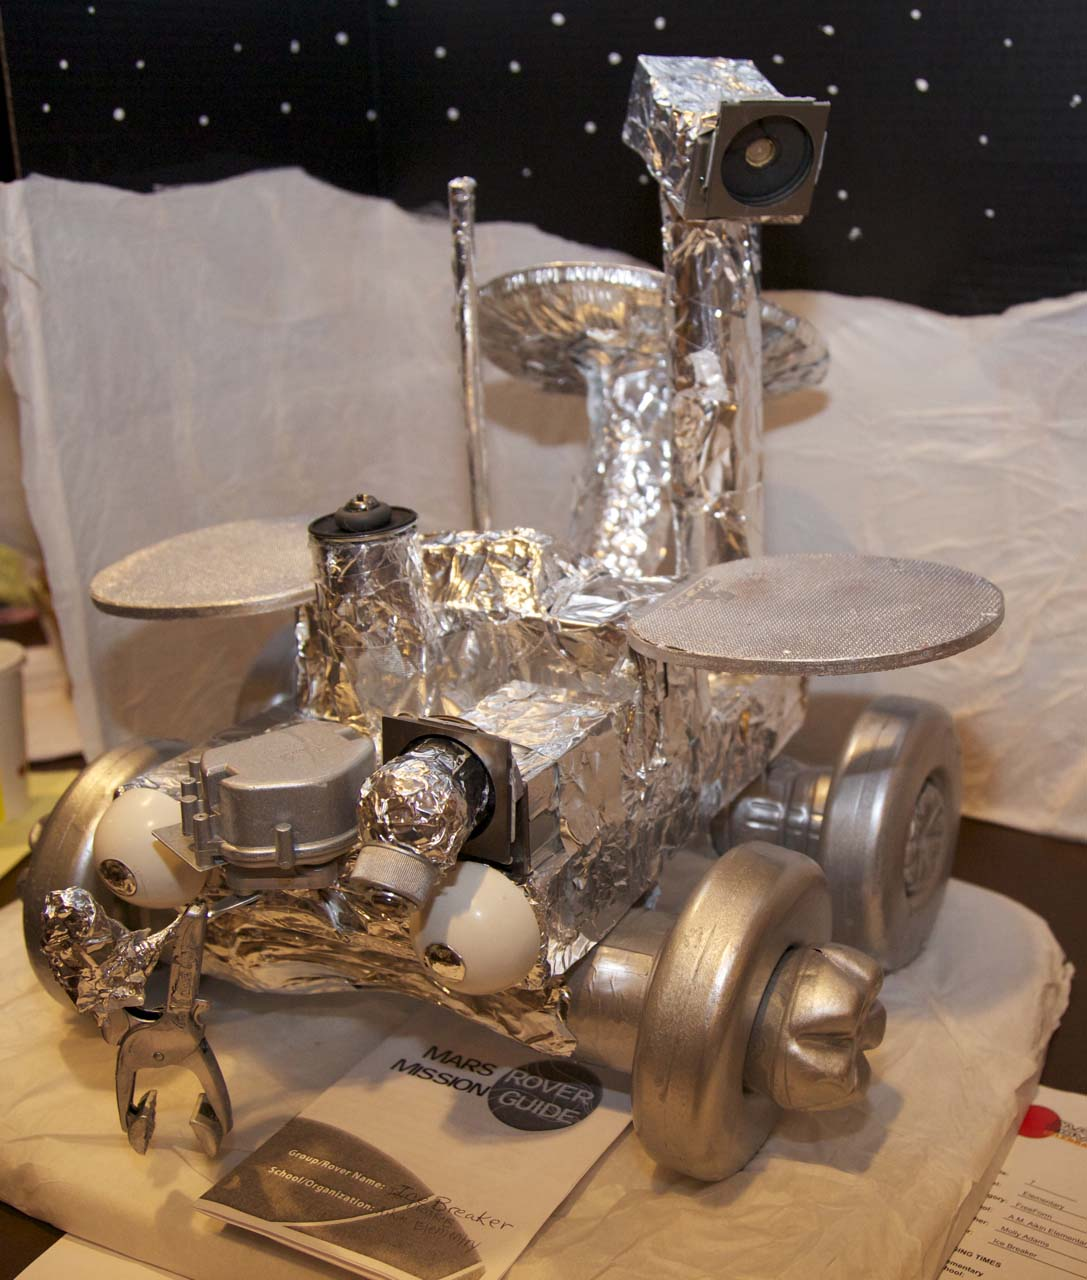 mars rover school project - photo #4